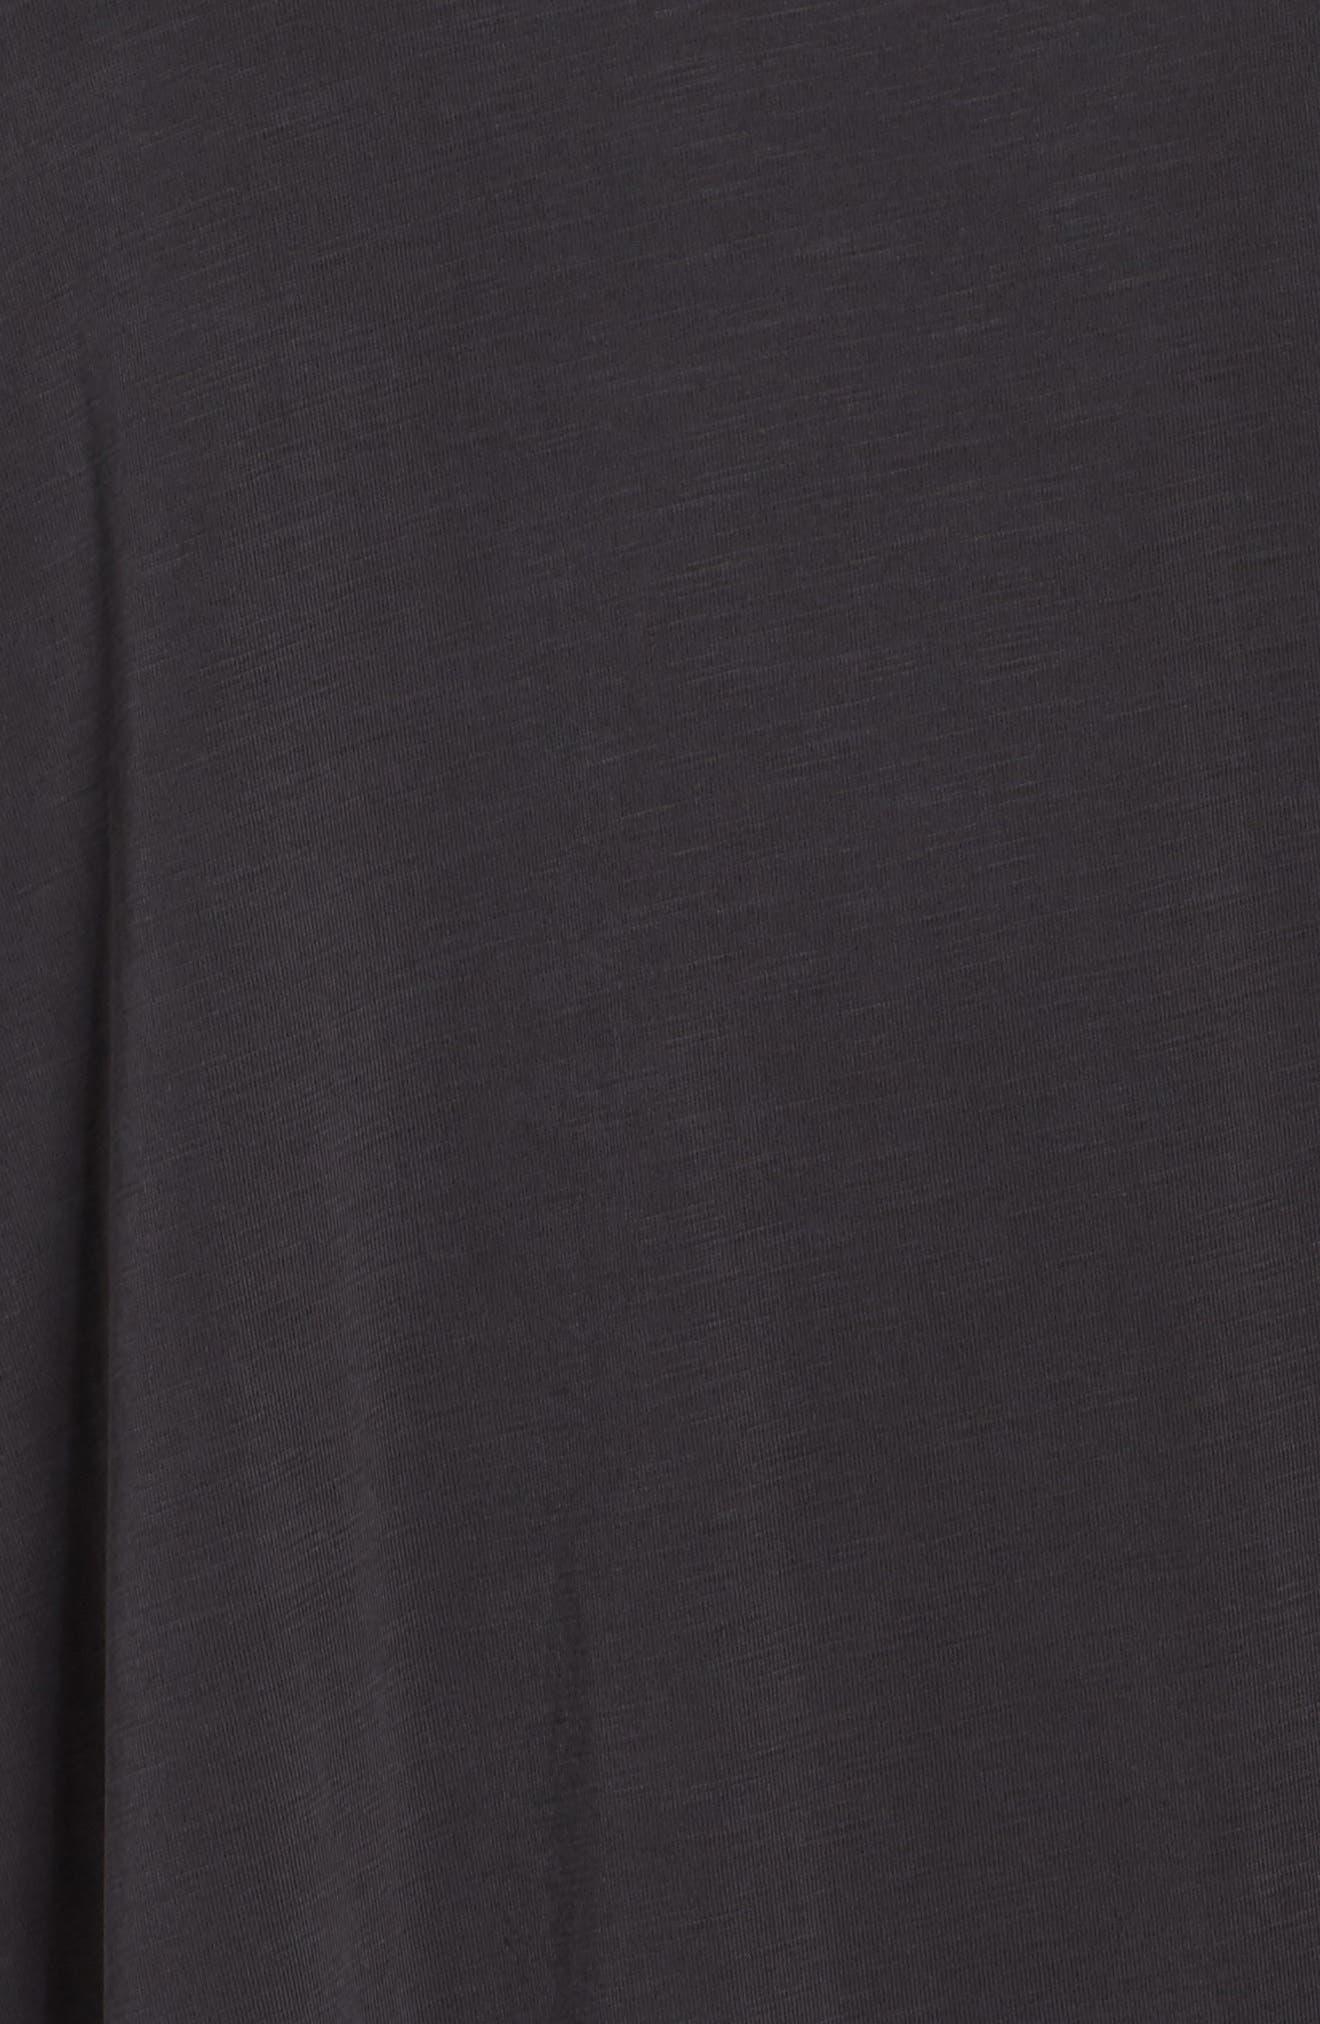 Boardwalk Convertible Jersey Dress,                             Alternate thumbnail 5, color,                             Washed Black